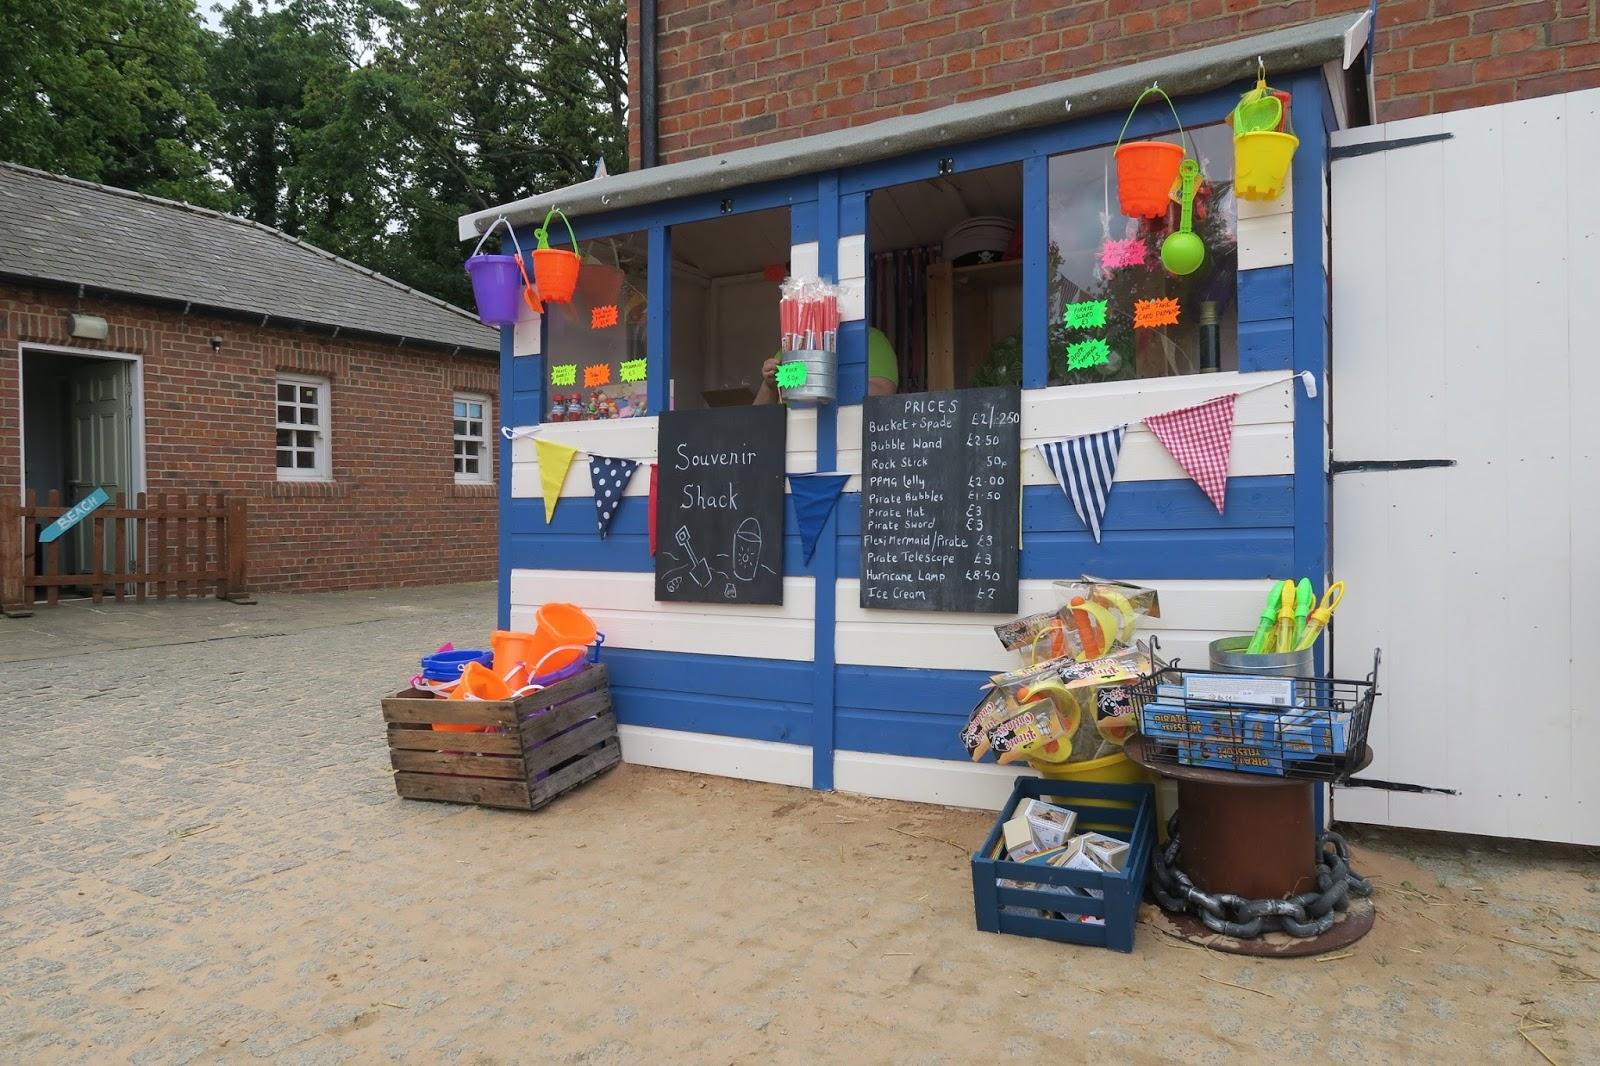 Preston Park Museum | Teddy Bears Picnic - A Review